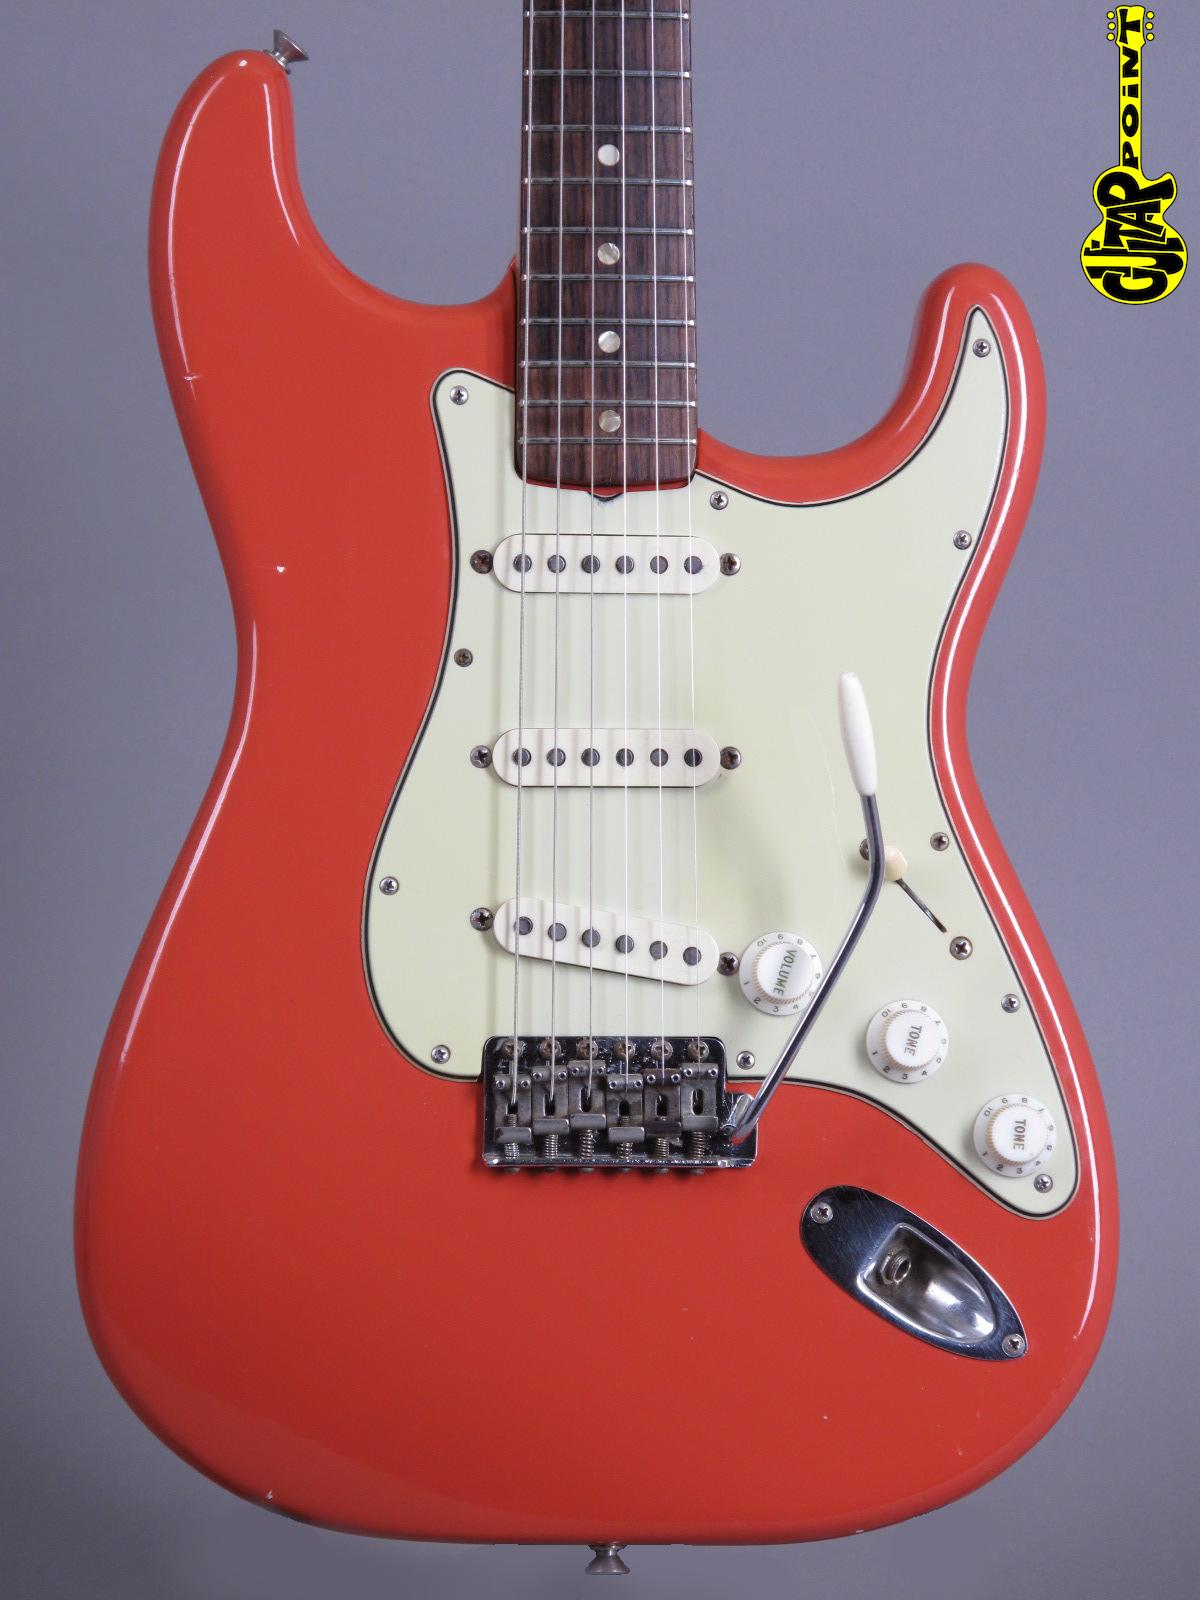 1965 Fender Stratocaster - Fiesta Red (Refin)